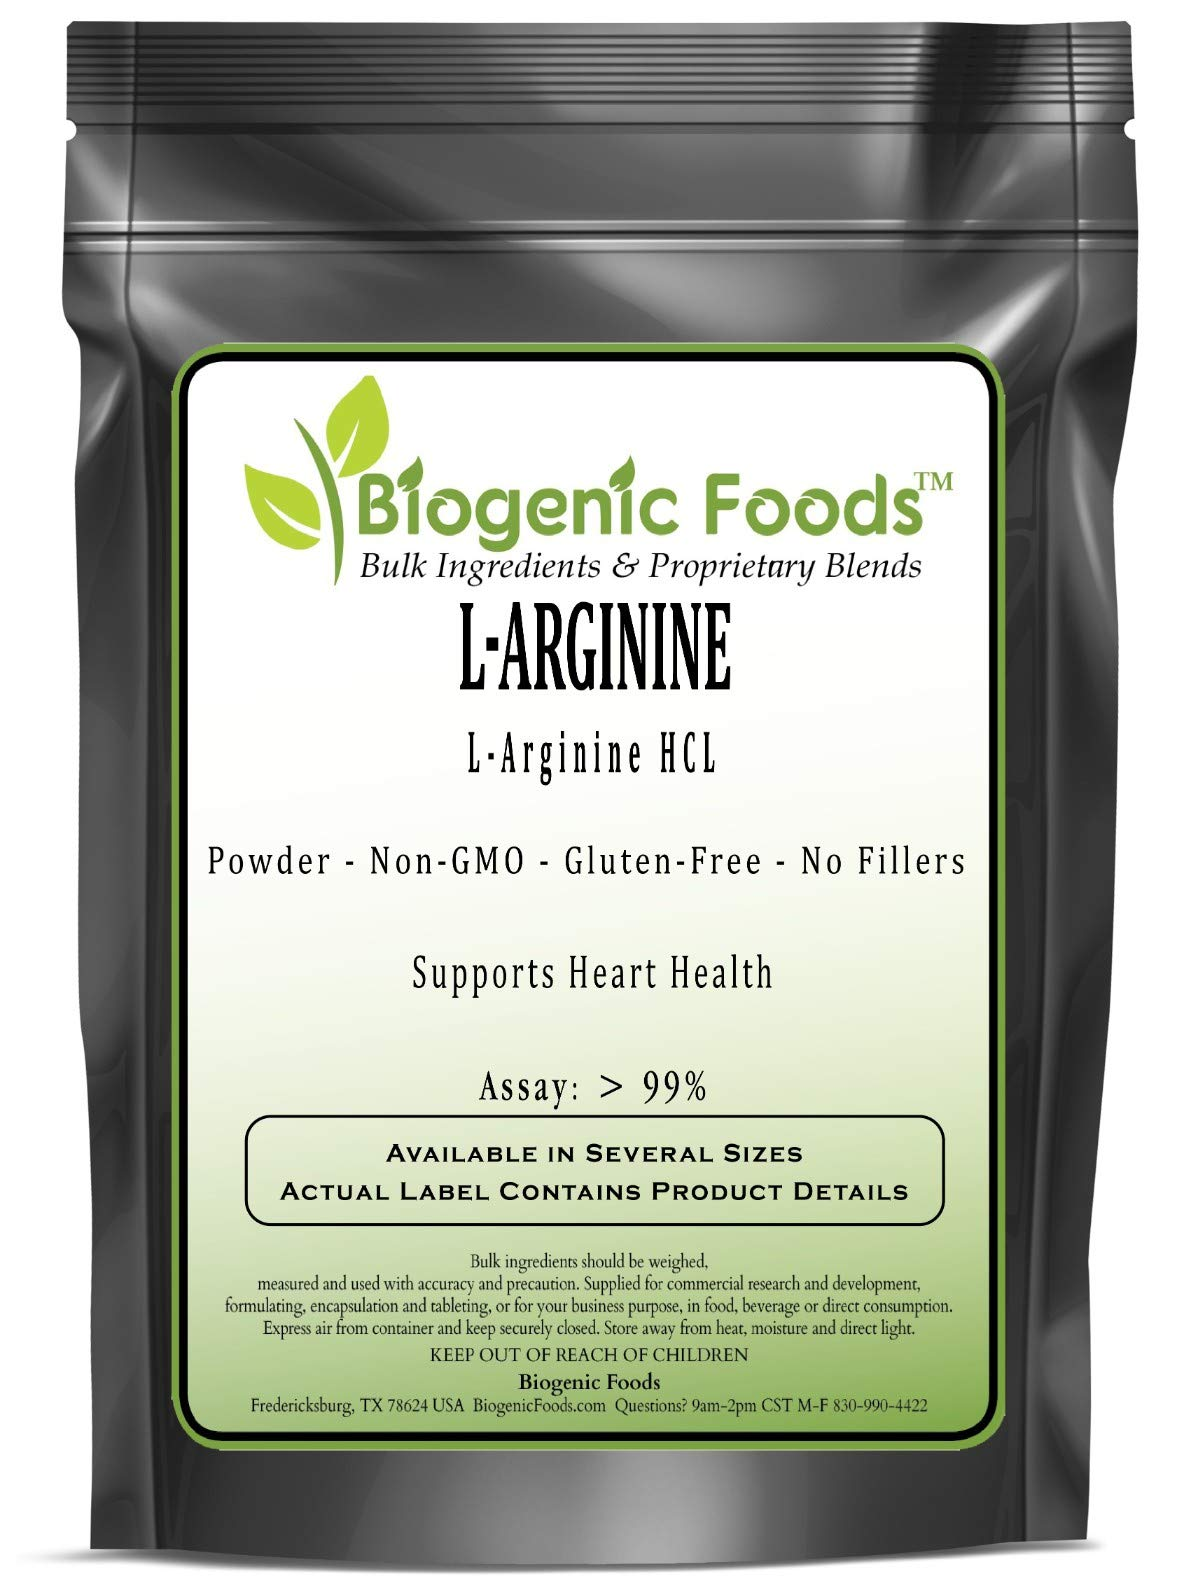 Arginine (L) - L-Arginine HCL Amino Acid Powder (Assay: > 99%), 25 kg